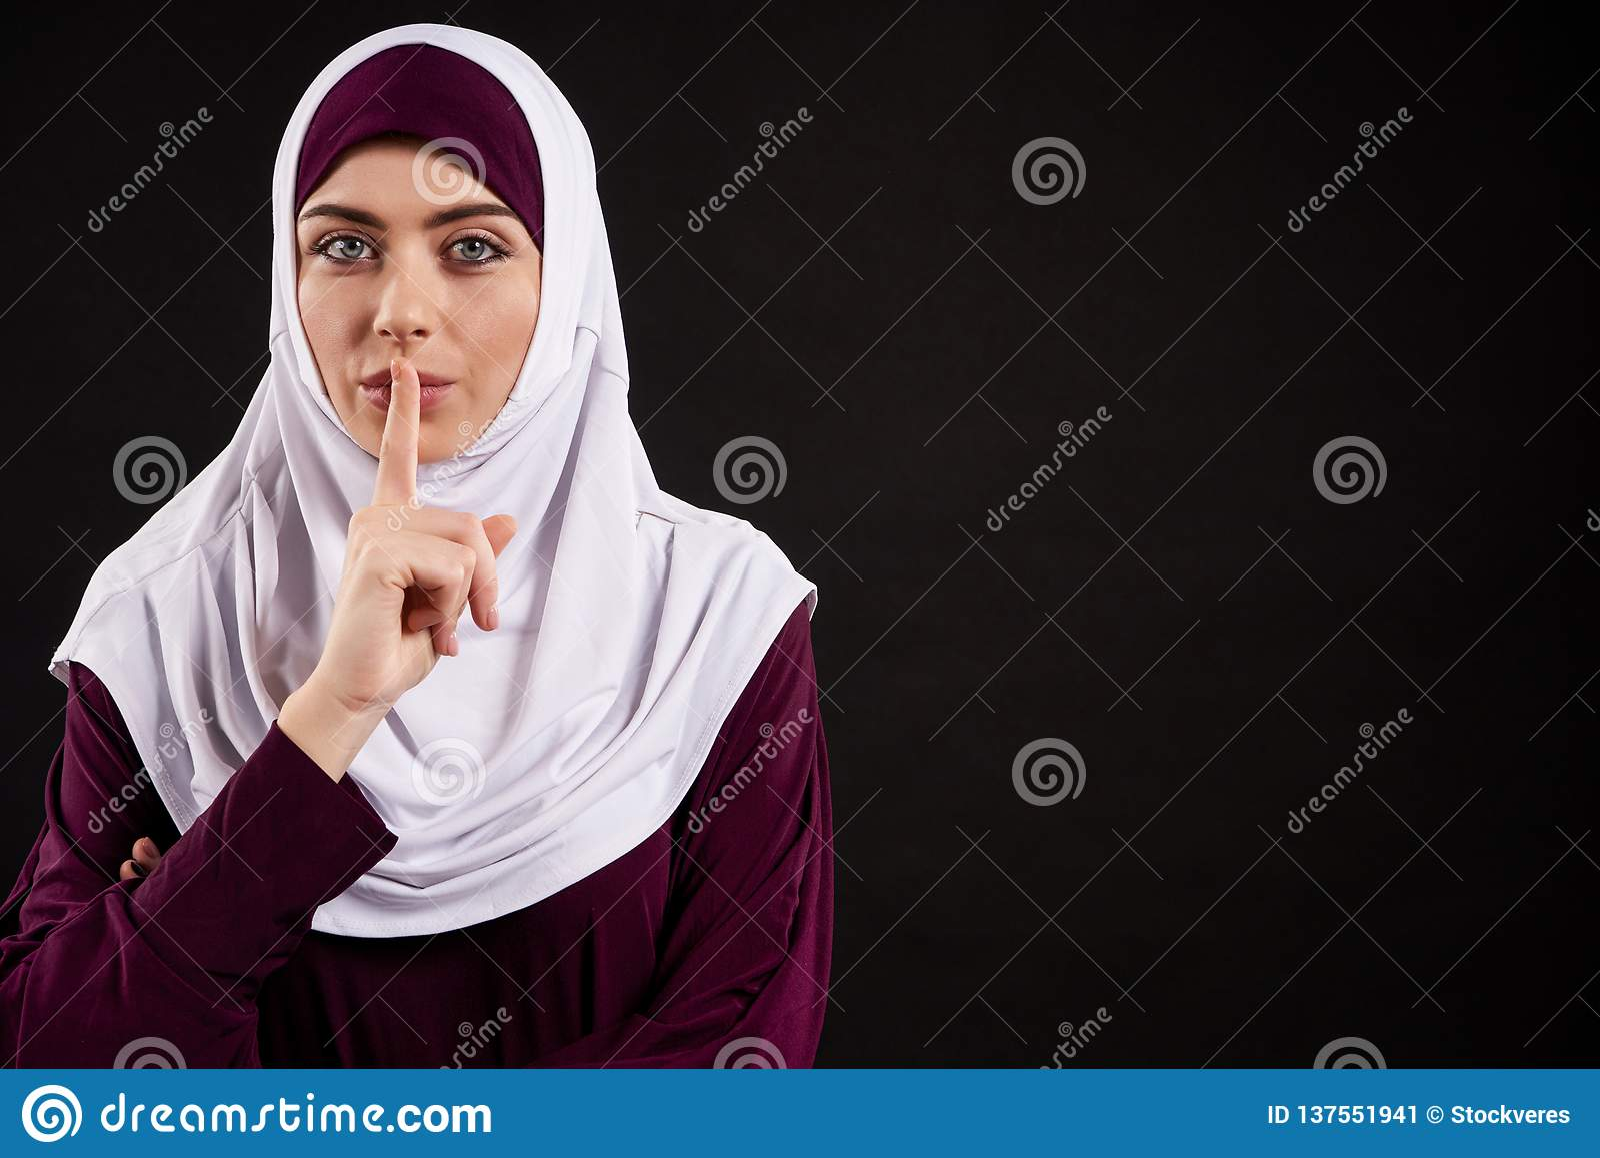 Arabische Frau in hijab Shows gestikulieren ruhig